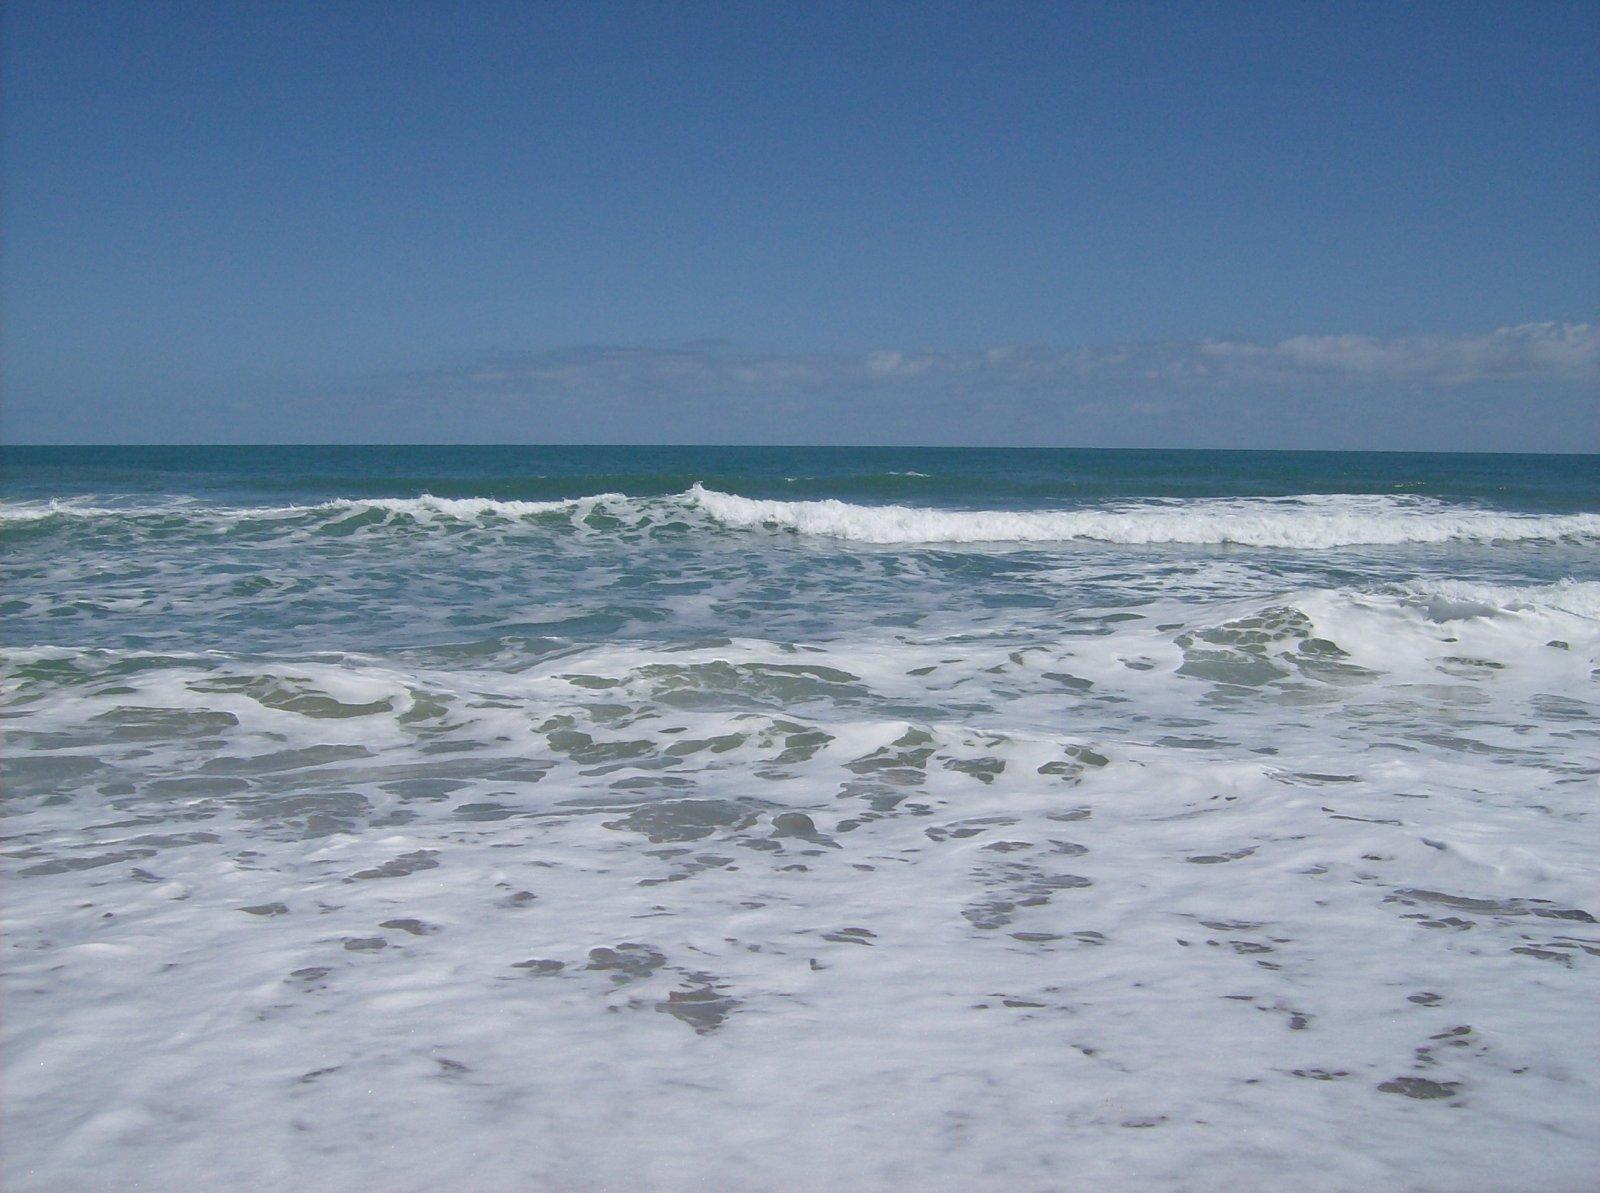 Click image for larger version  Name:Playalina Beach & Florida Gators 001.jpg Views:89 Size:238.2 KB ID:153341